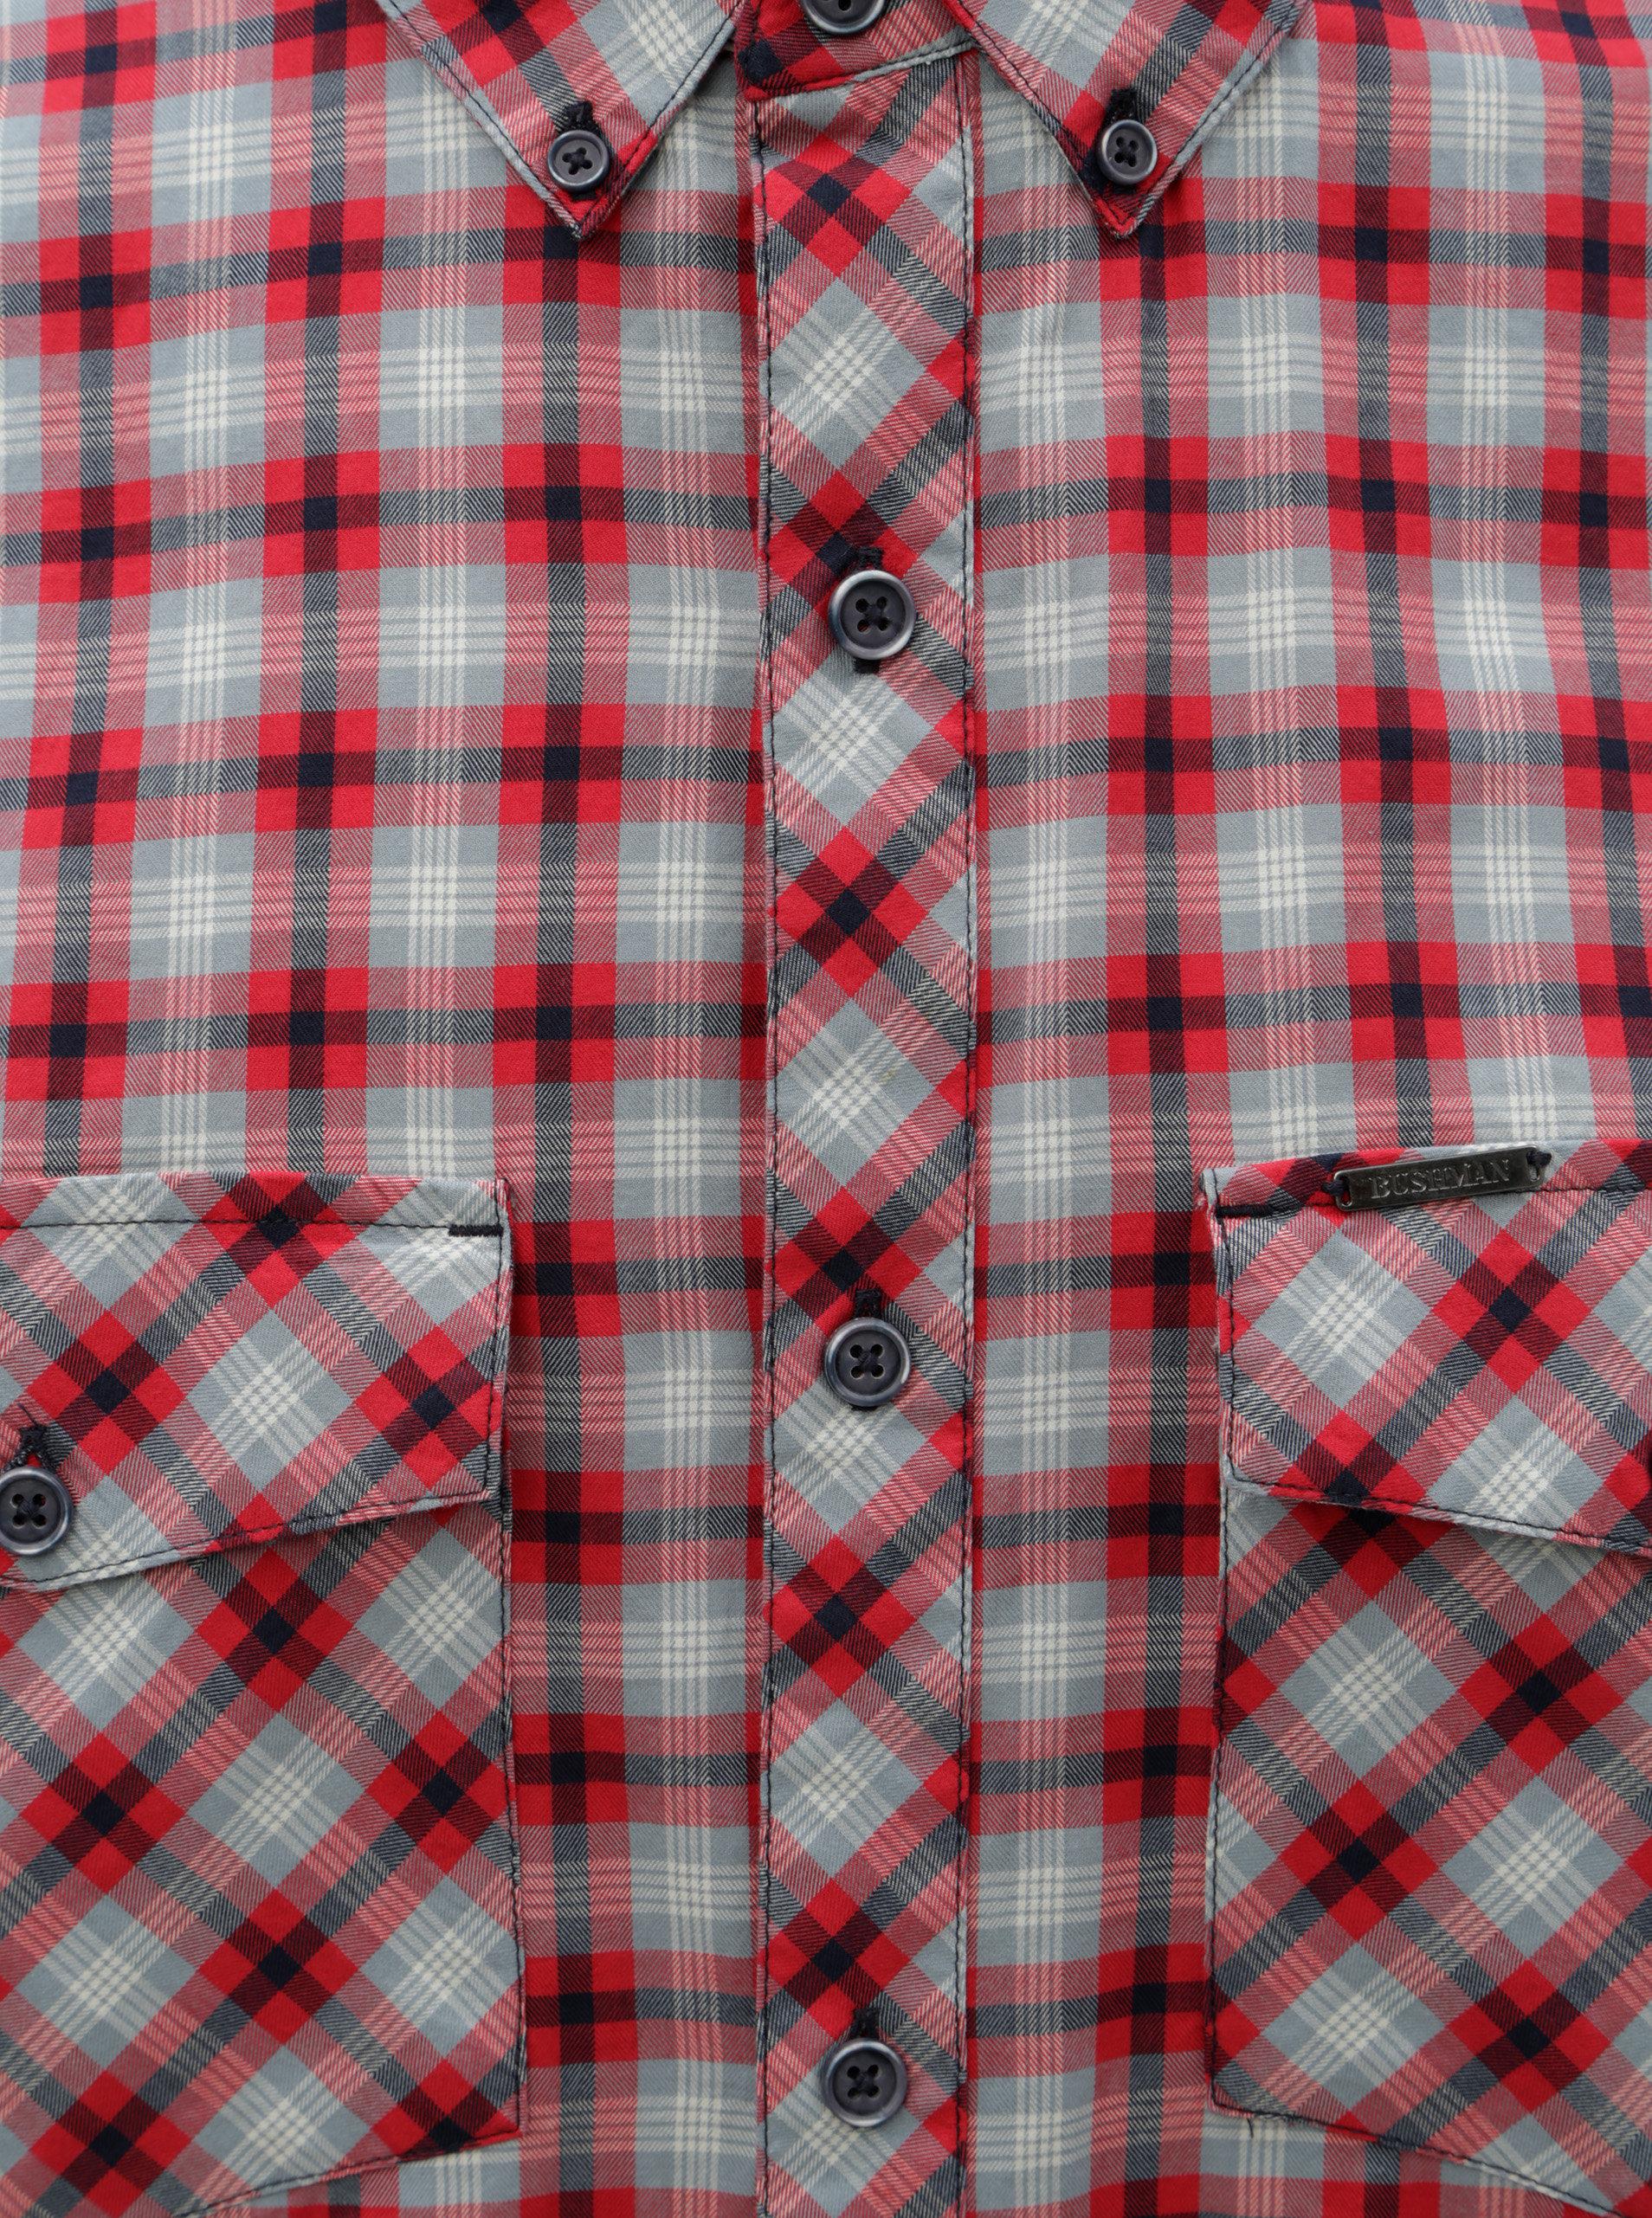 Modro-červená pánská kostkovaná košile BUSHMAN Gresham ... 4373e61afe